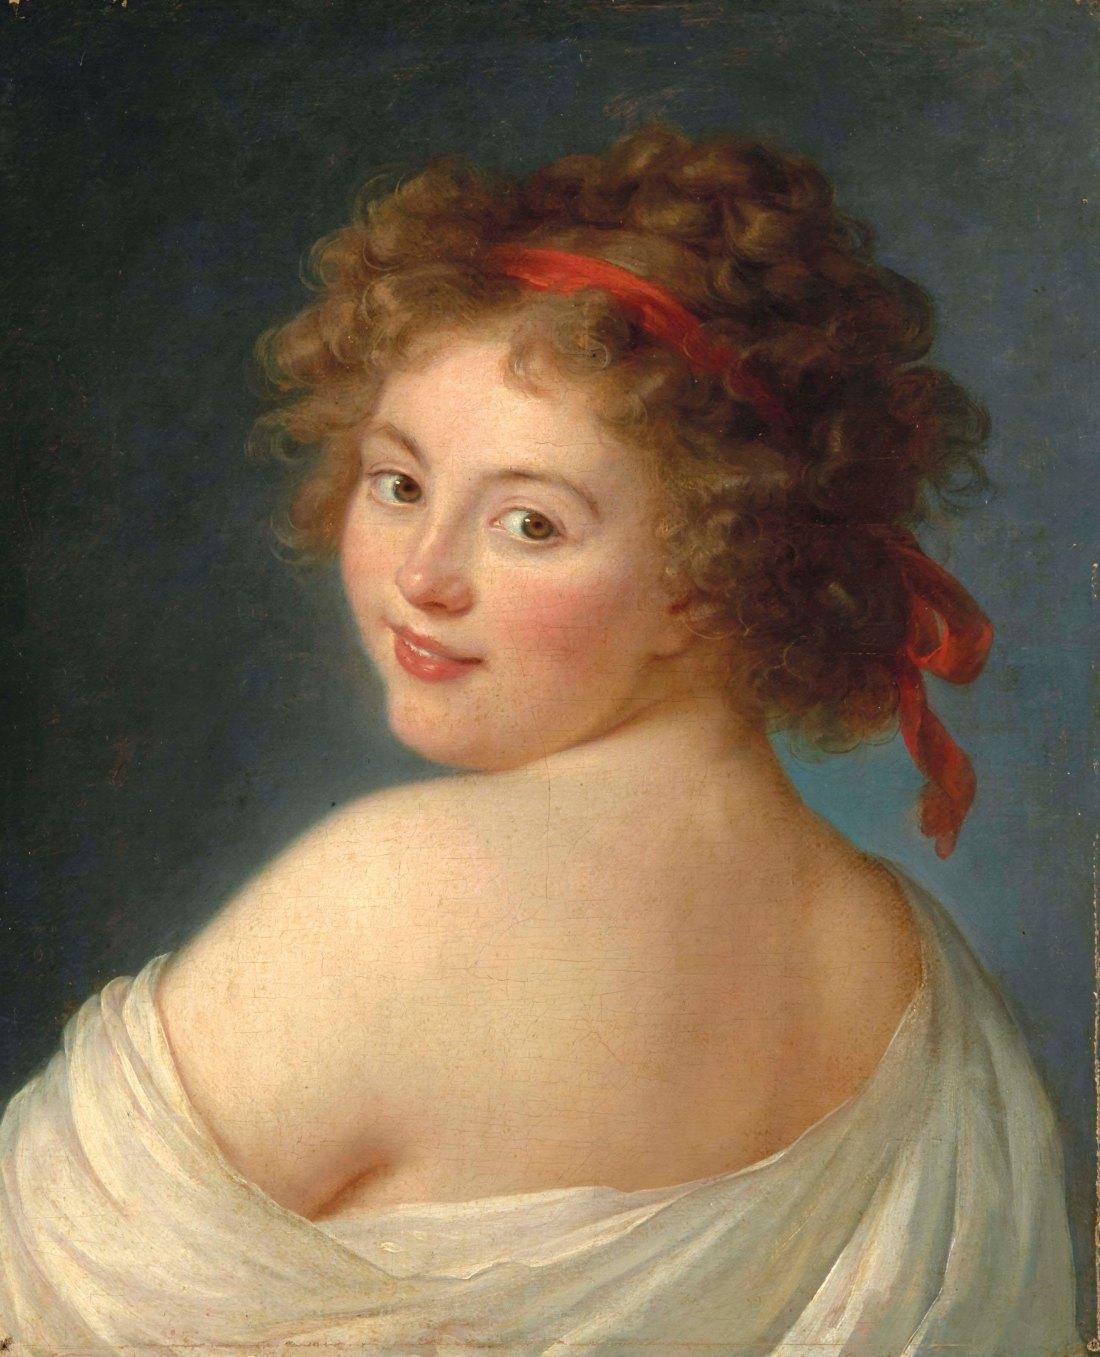 Portrait assumed to be Ekaterina Vassilievna Skavronskaia, comtesse Litta. 1790.